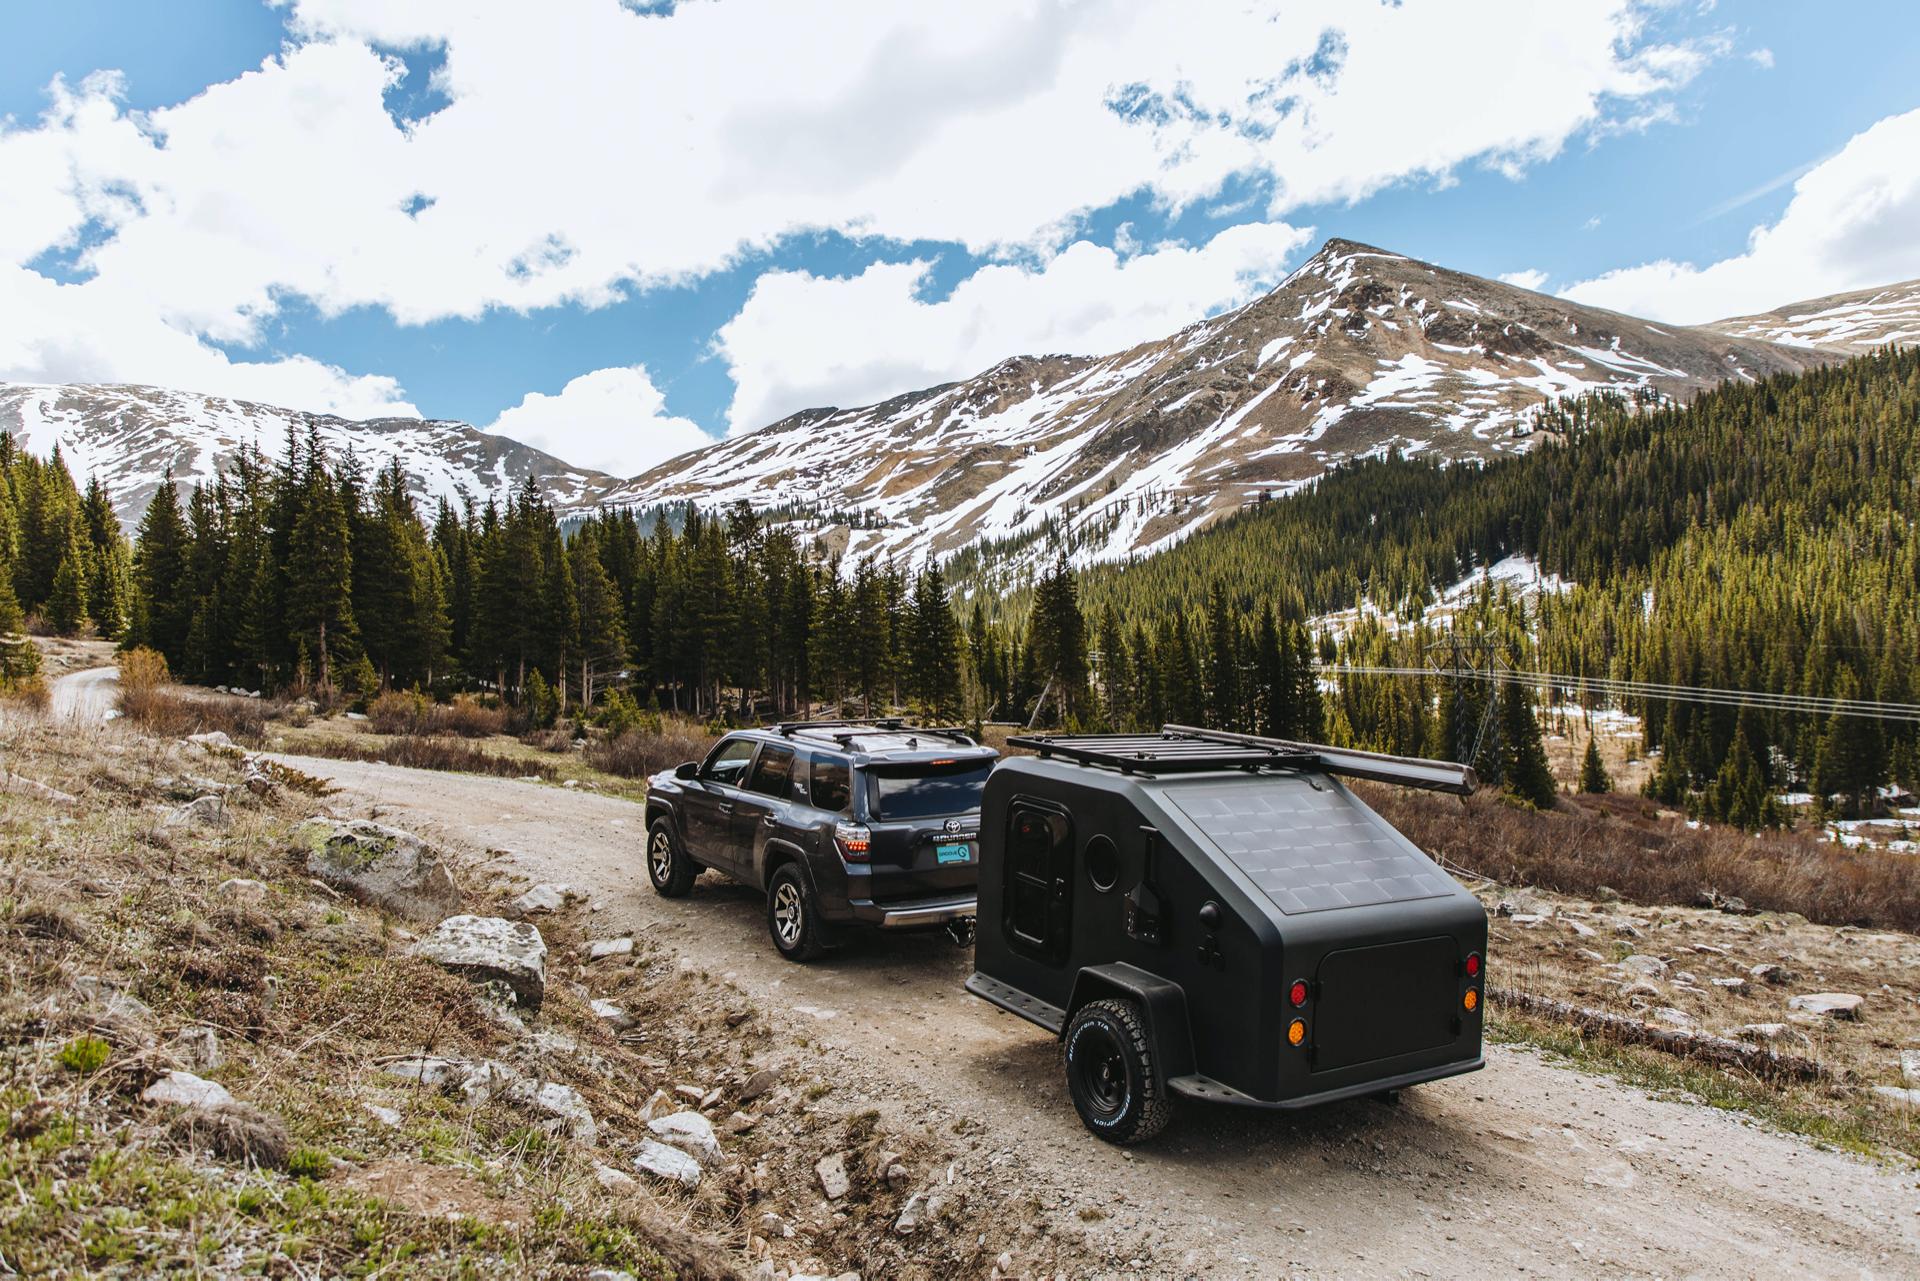 4runner-pulls-trailer-up-mountain-road